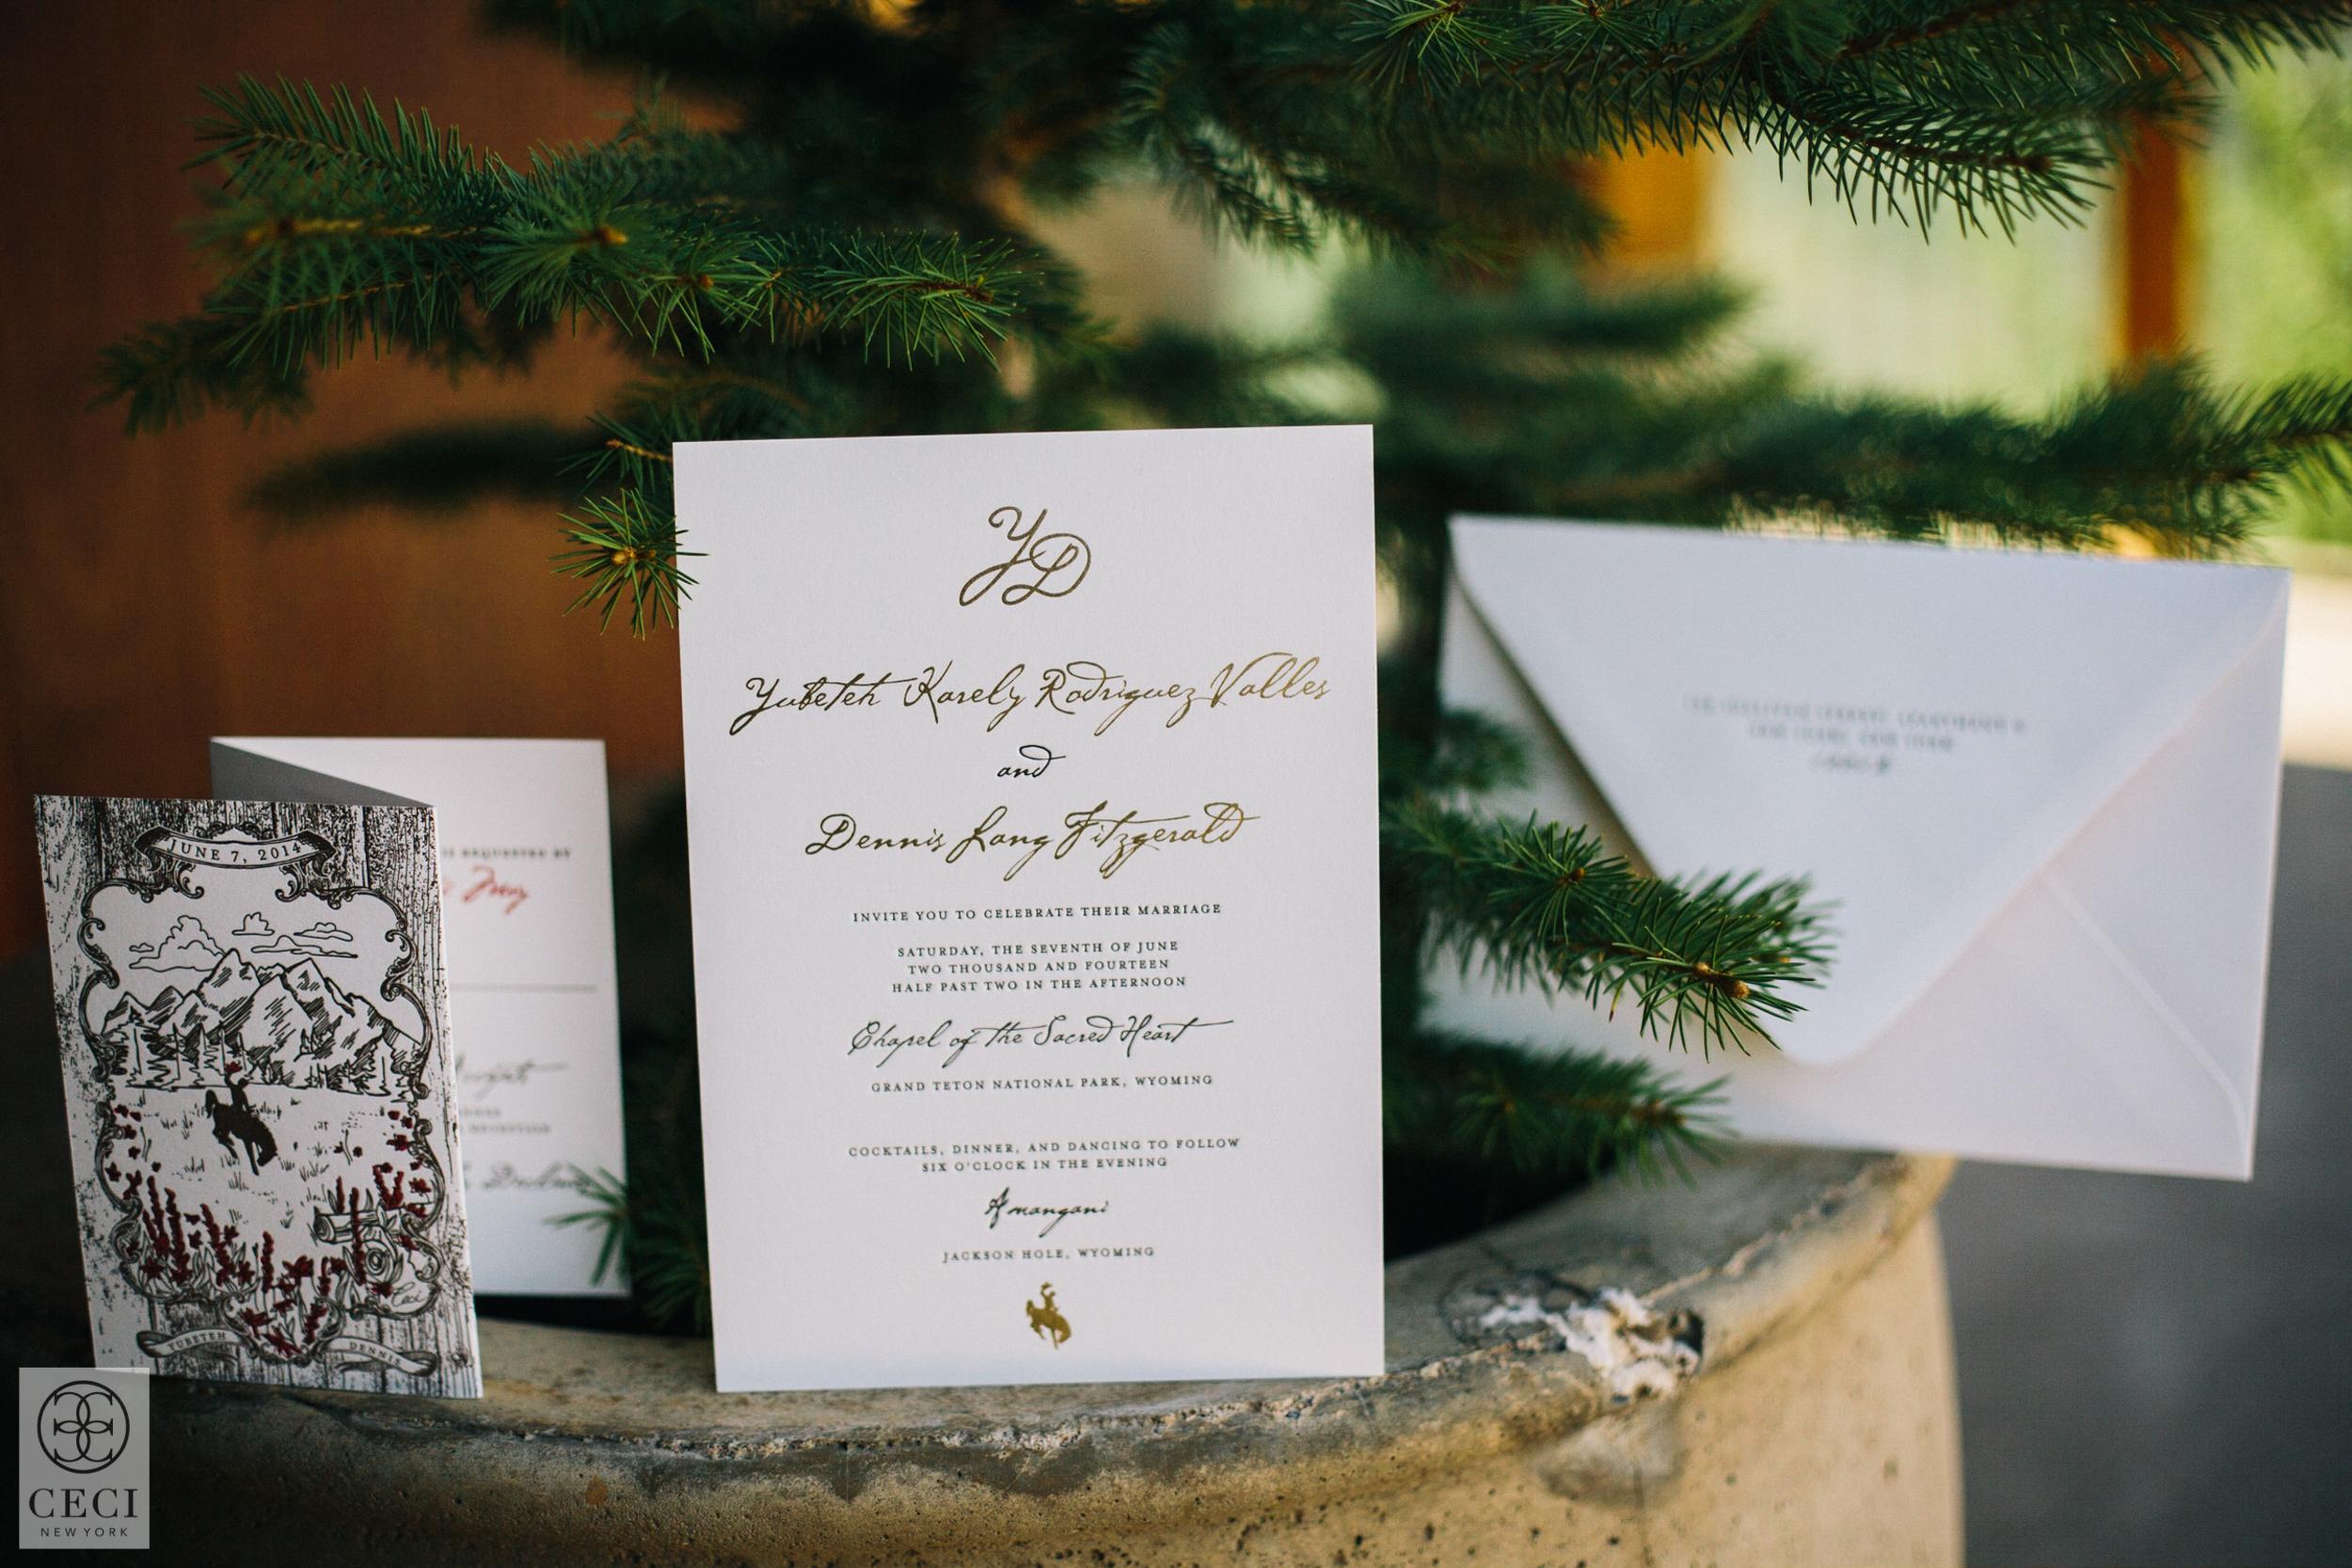 Ceci_New_York_Lyndsey_Hamilton_Events_Invitations_Wedding_Amangani_Elegance_Gold_Foil_Letterpress_Classic_Stamping_Custom_Couture_Personalized-2.jpg